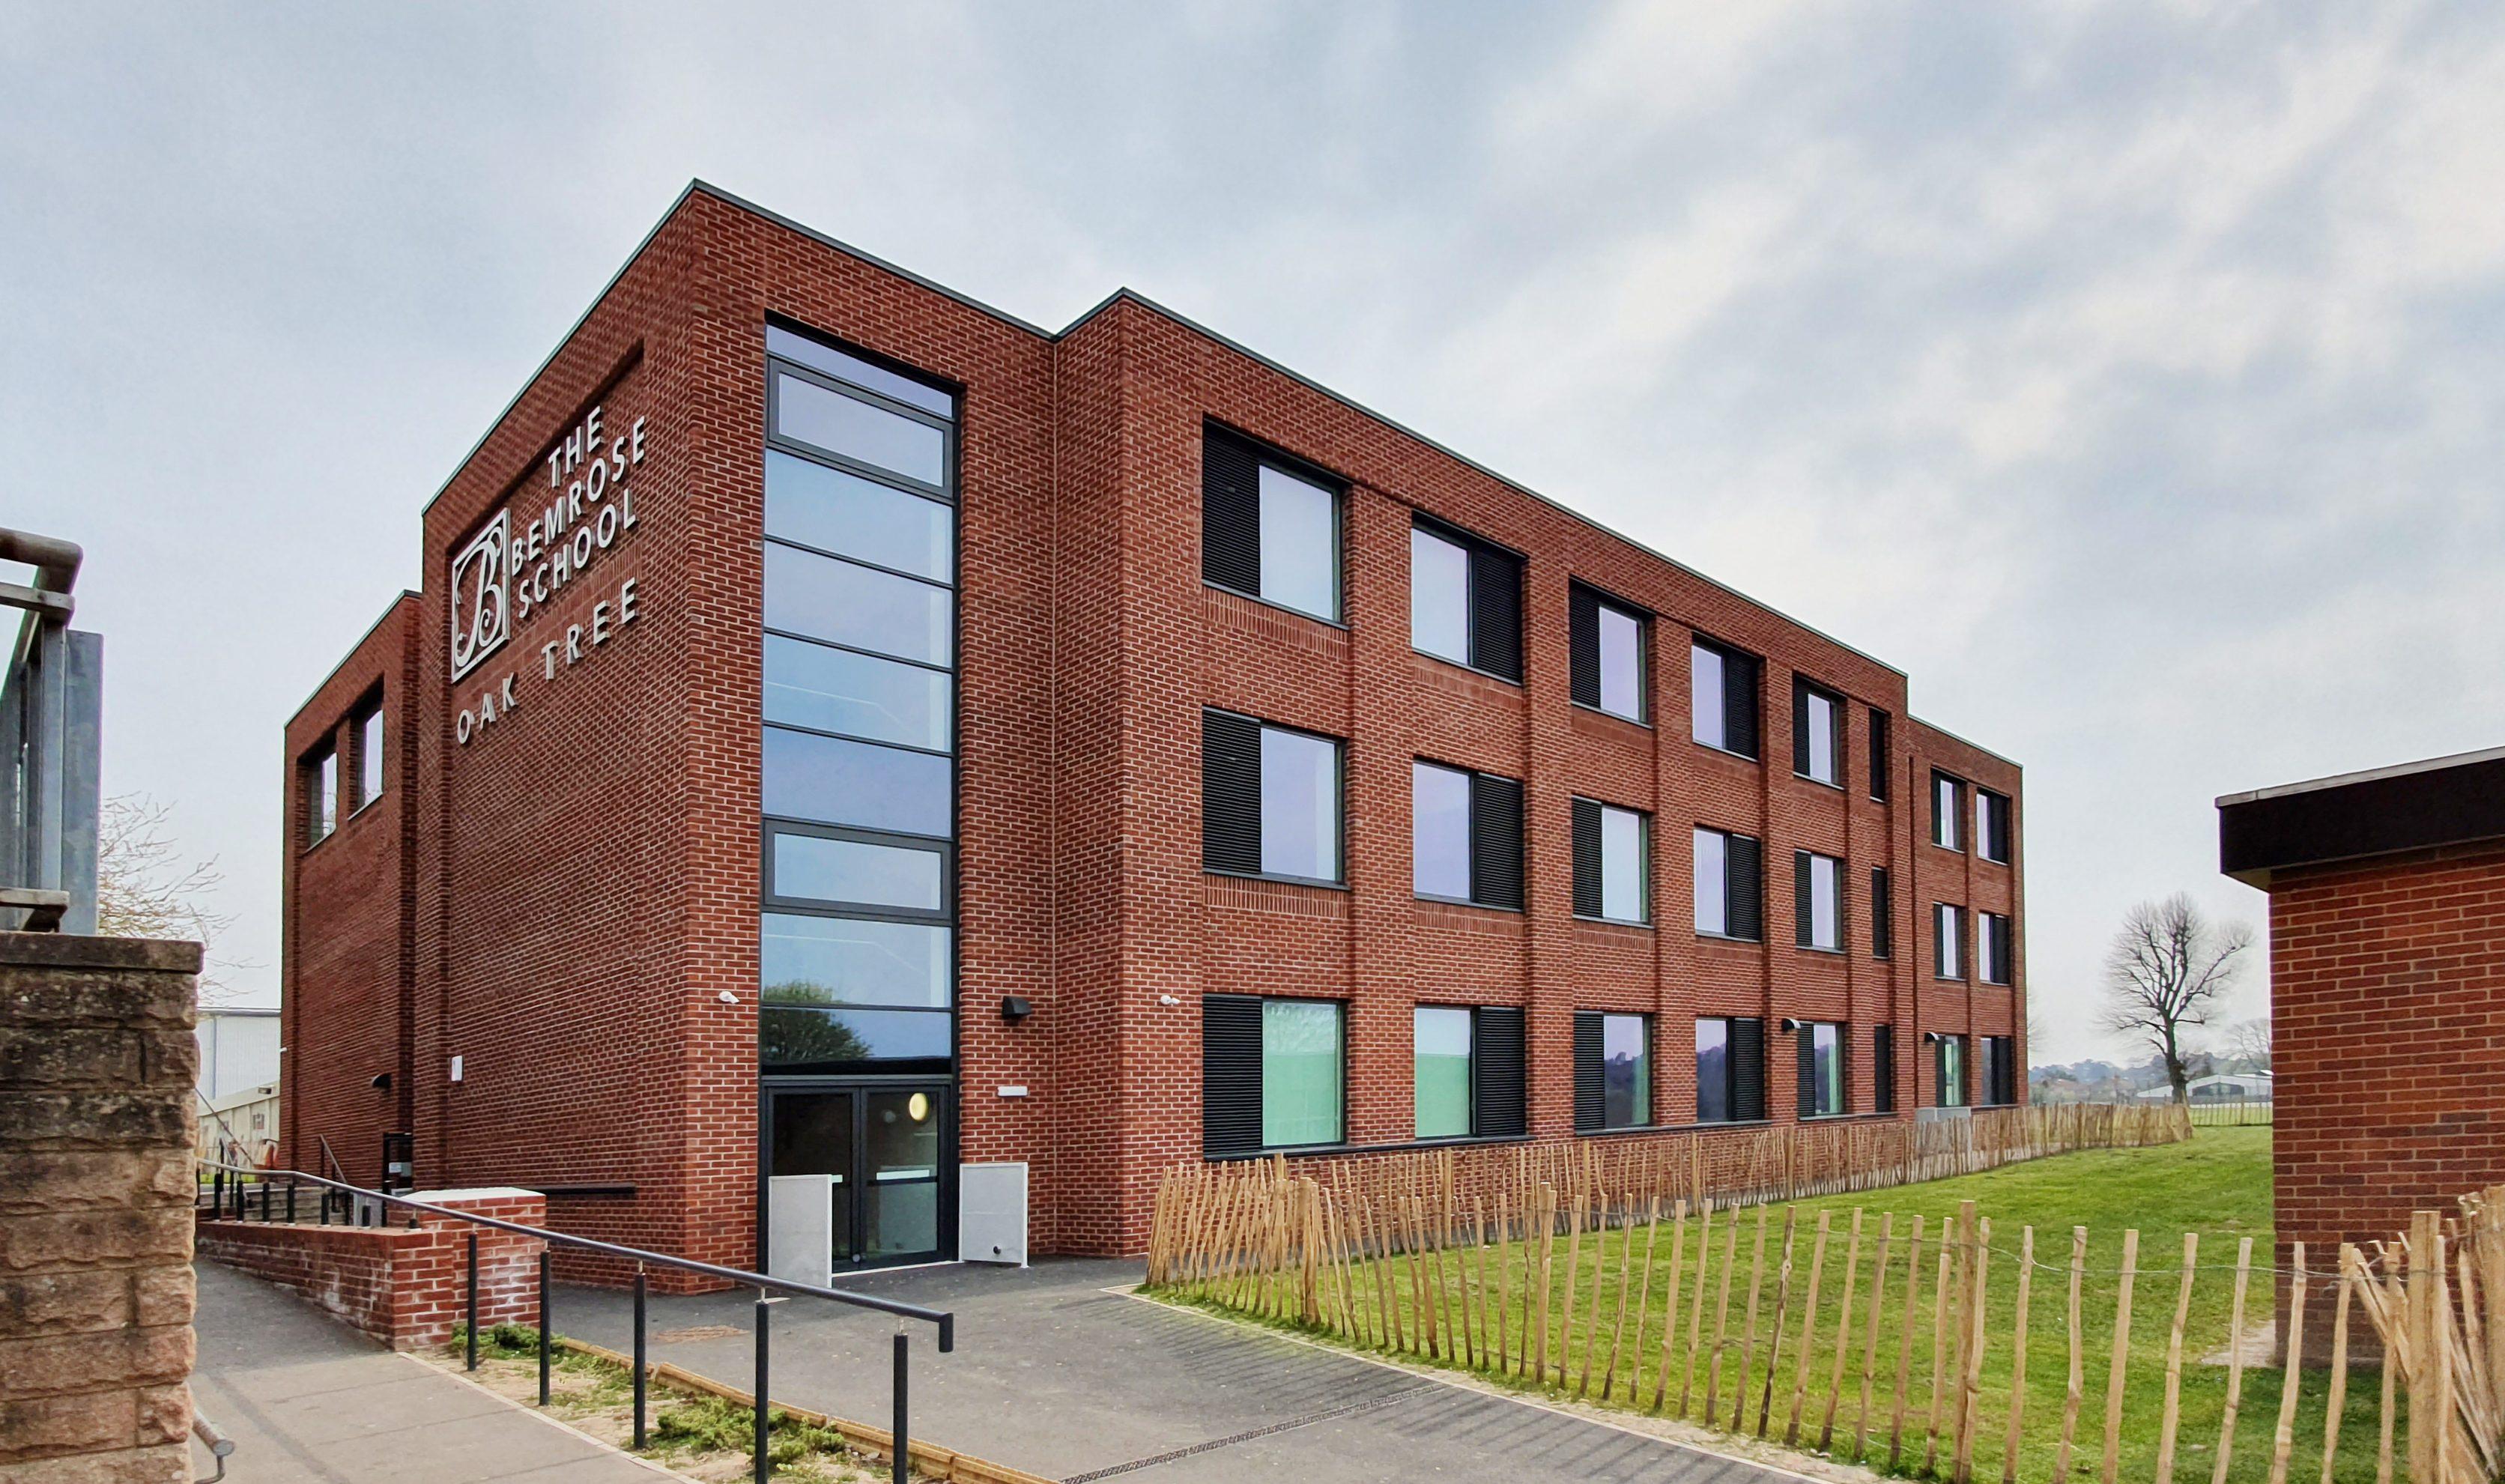 Bemrose School, Derby